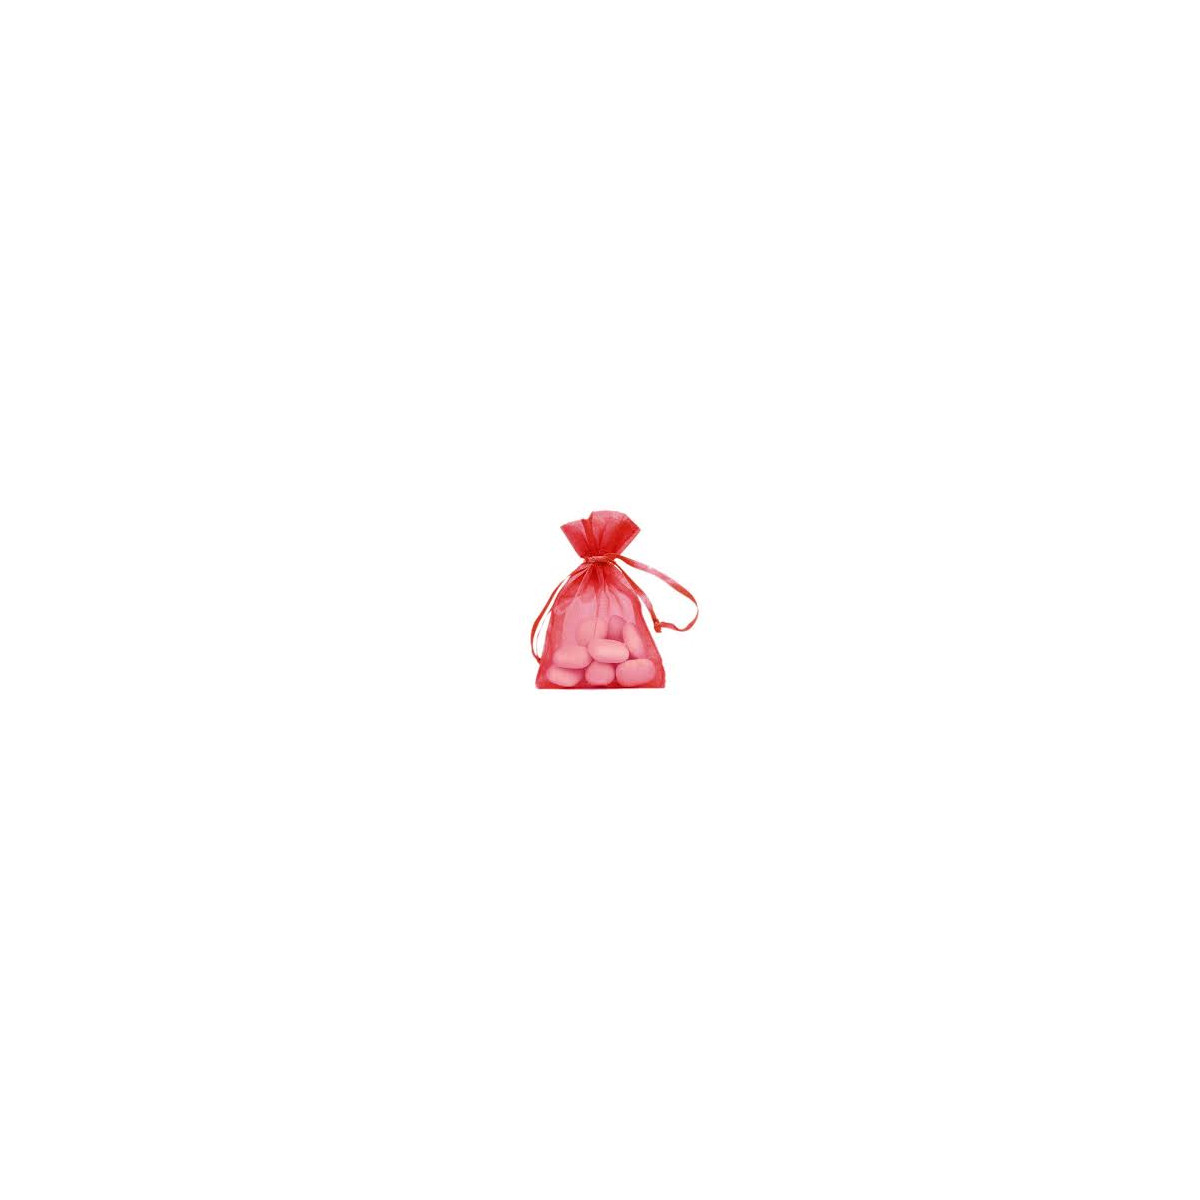 Lot de 10 sacs en organdi rouge